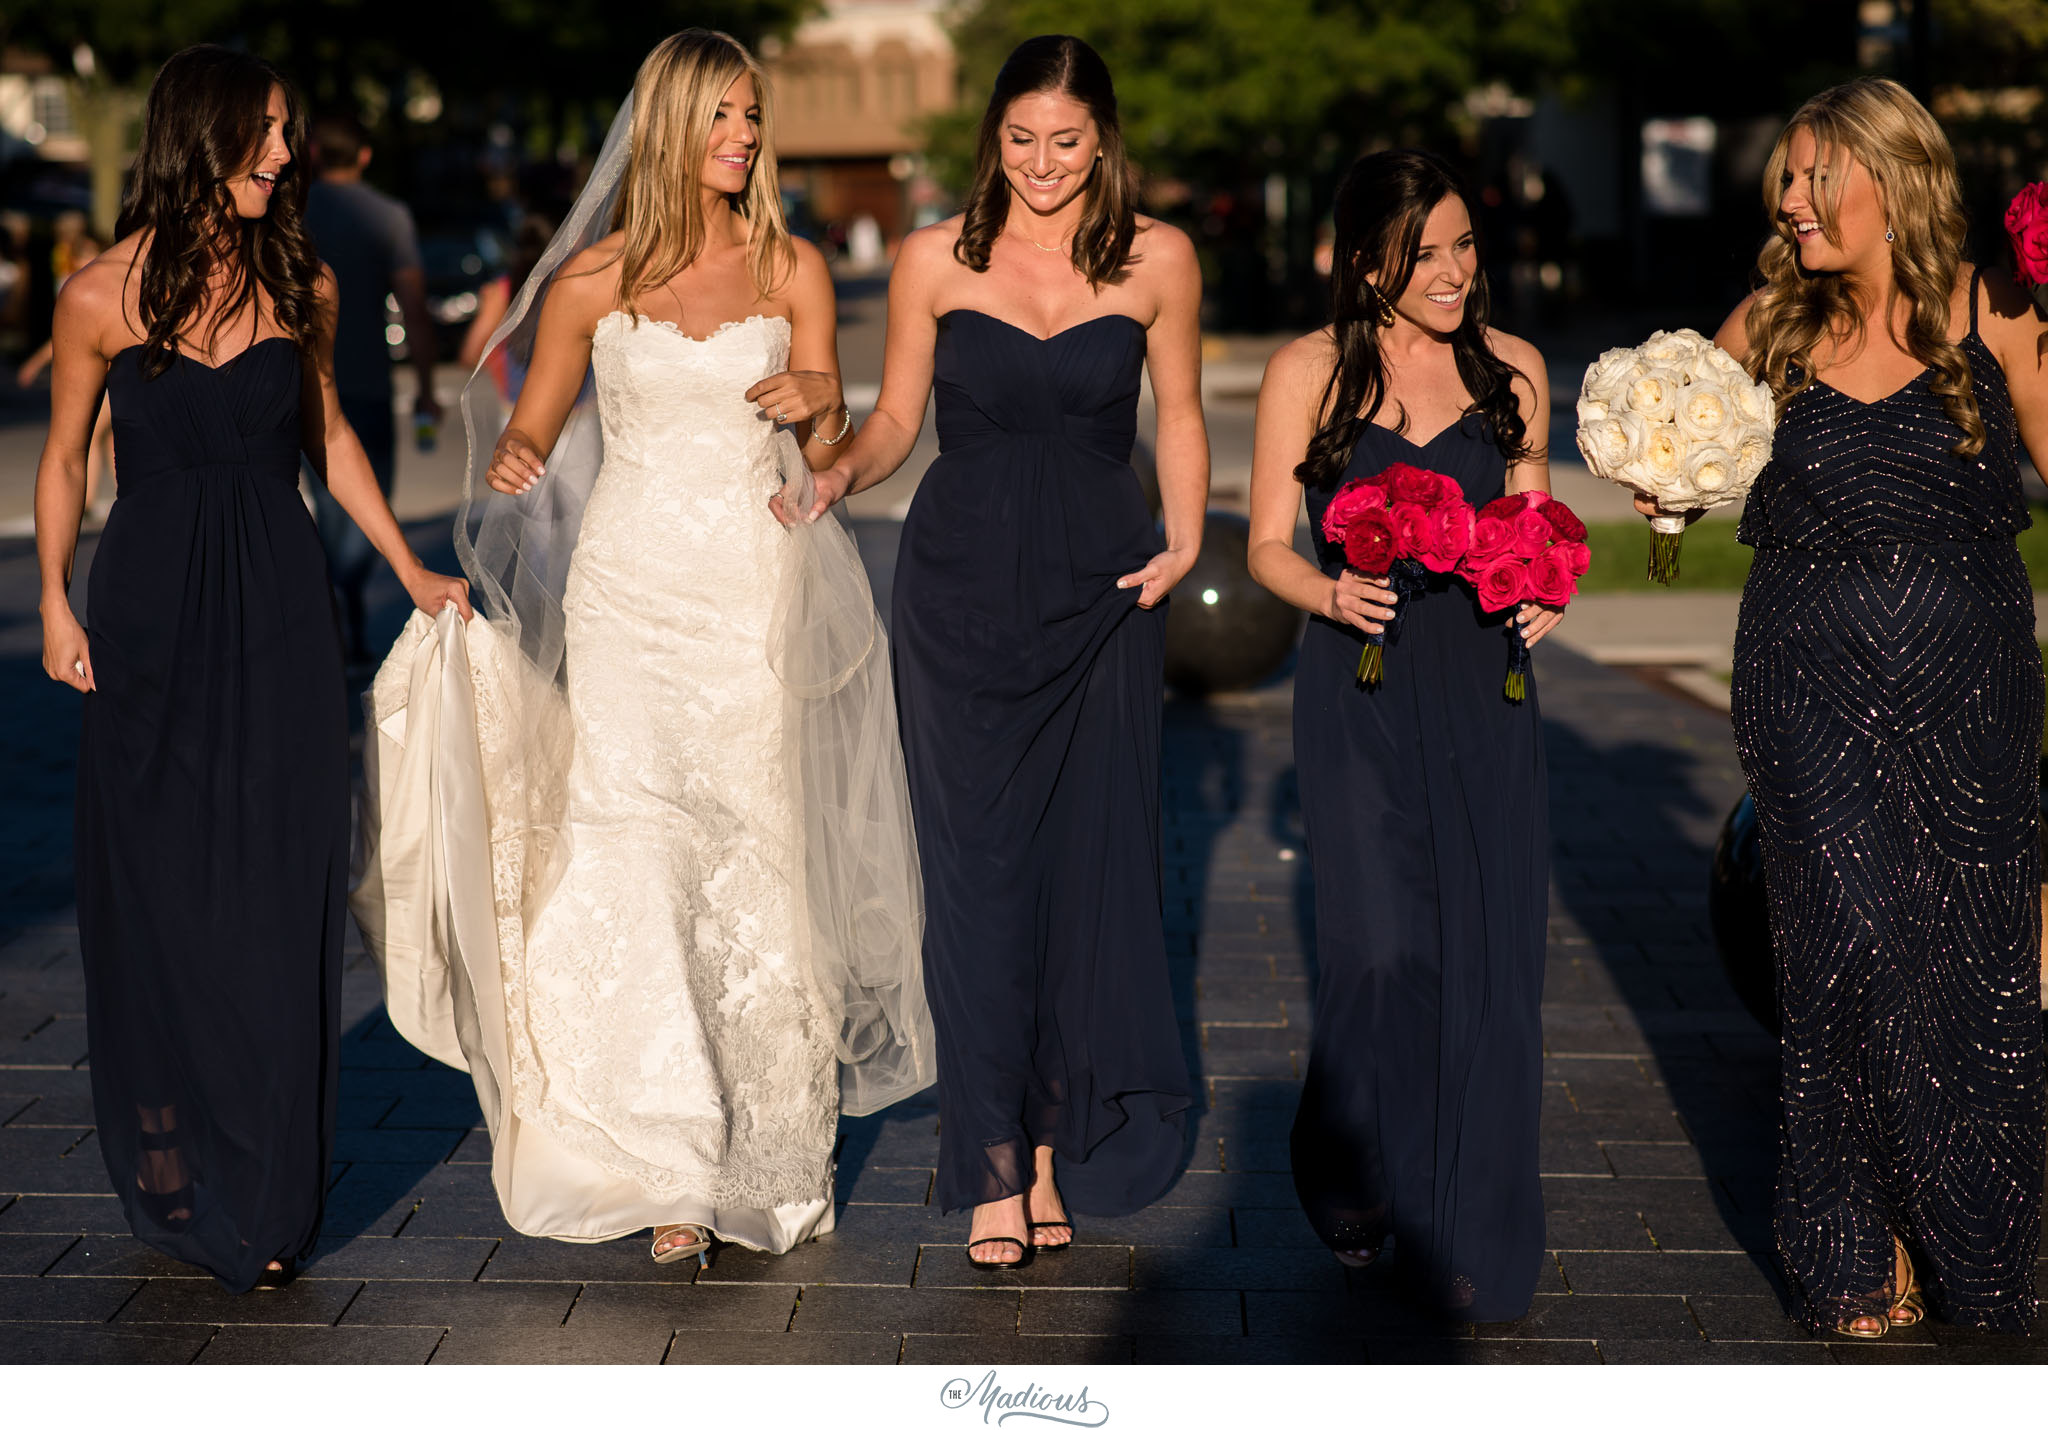 Townsend hotel michigan wedding_27.JPG